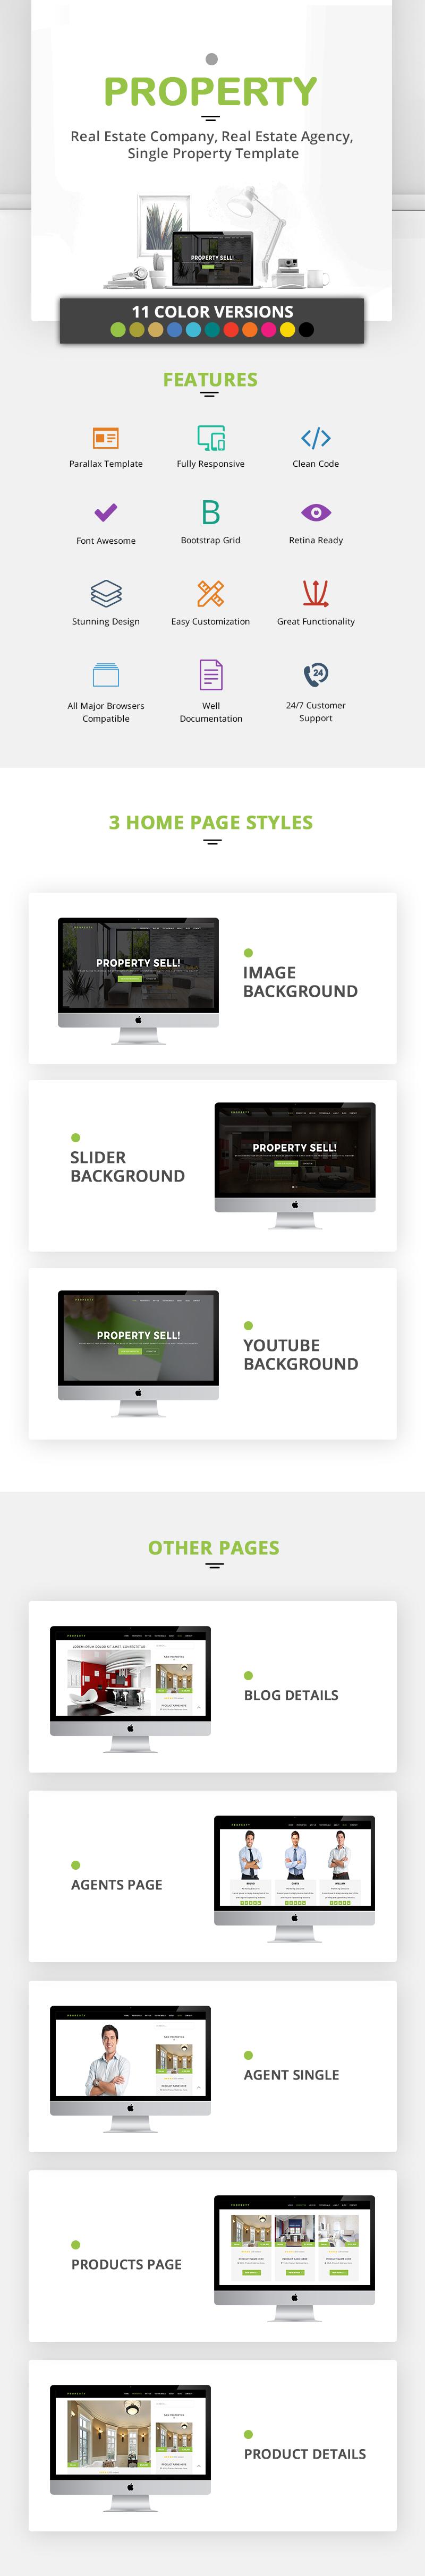 property-banner